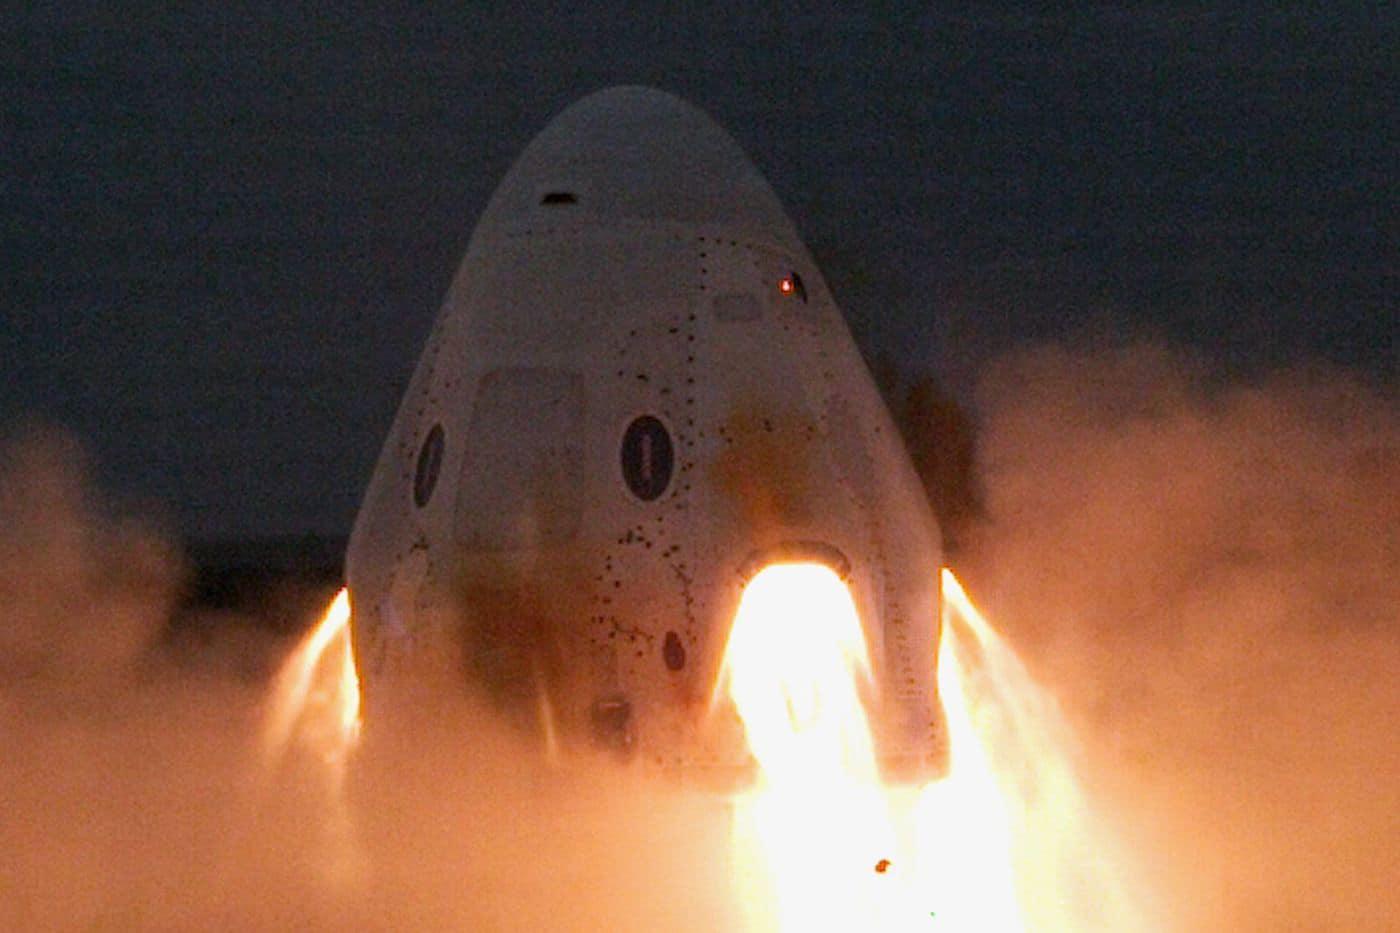 crew-dragon-static-fire-test.jpg